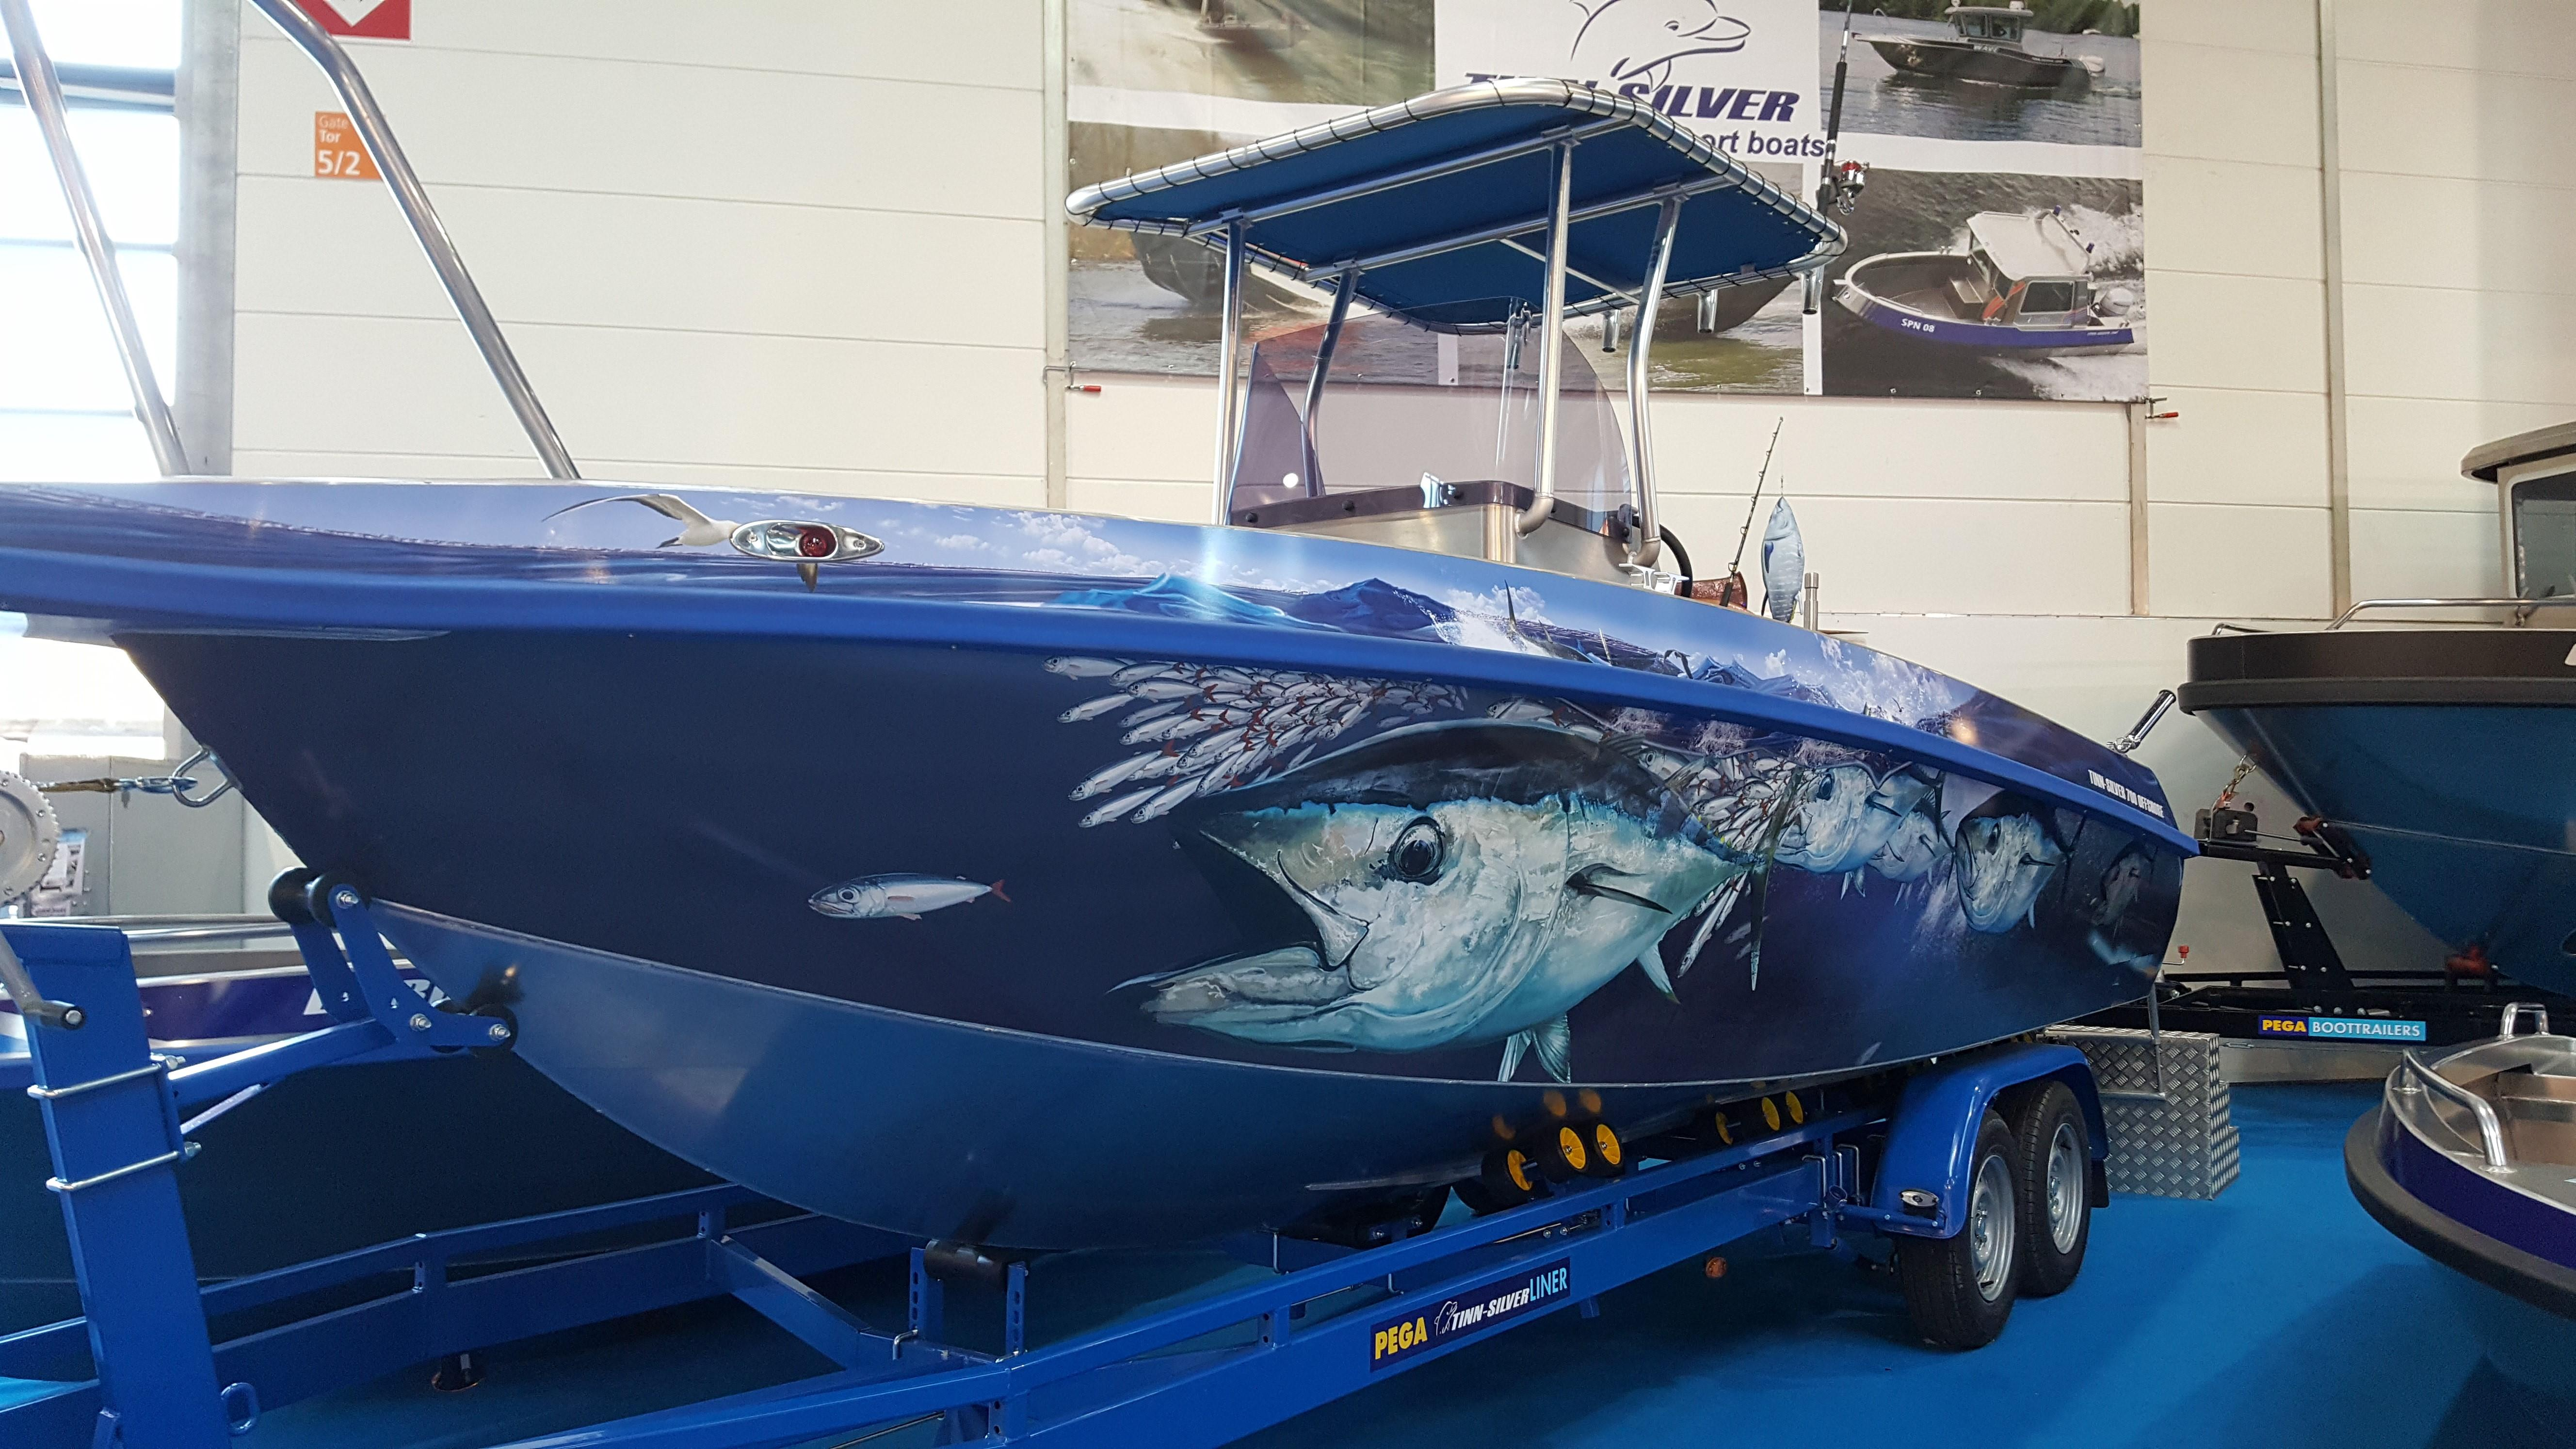 Tinn-Silver 700 Offshore